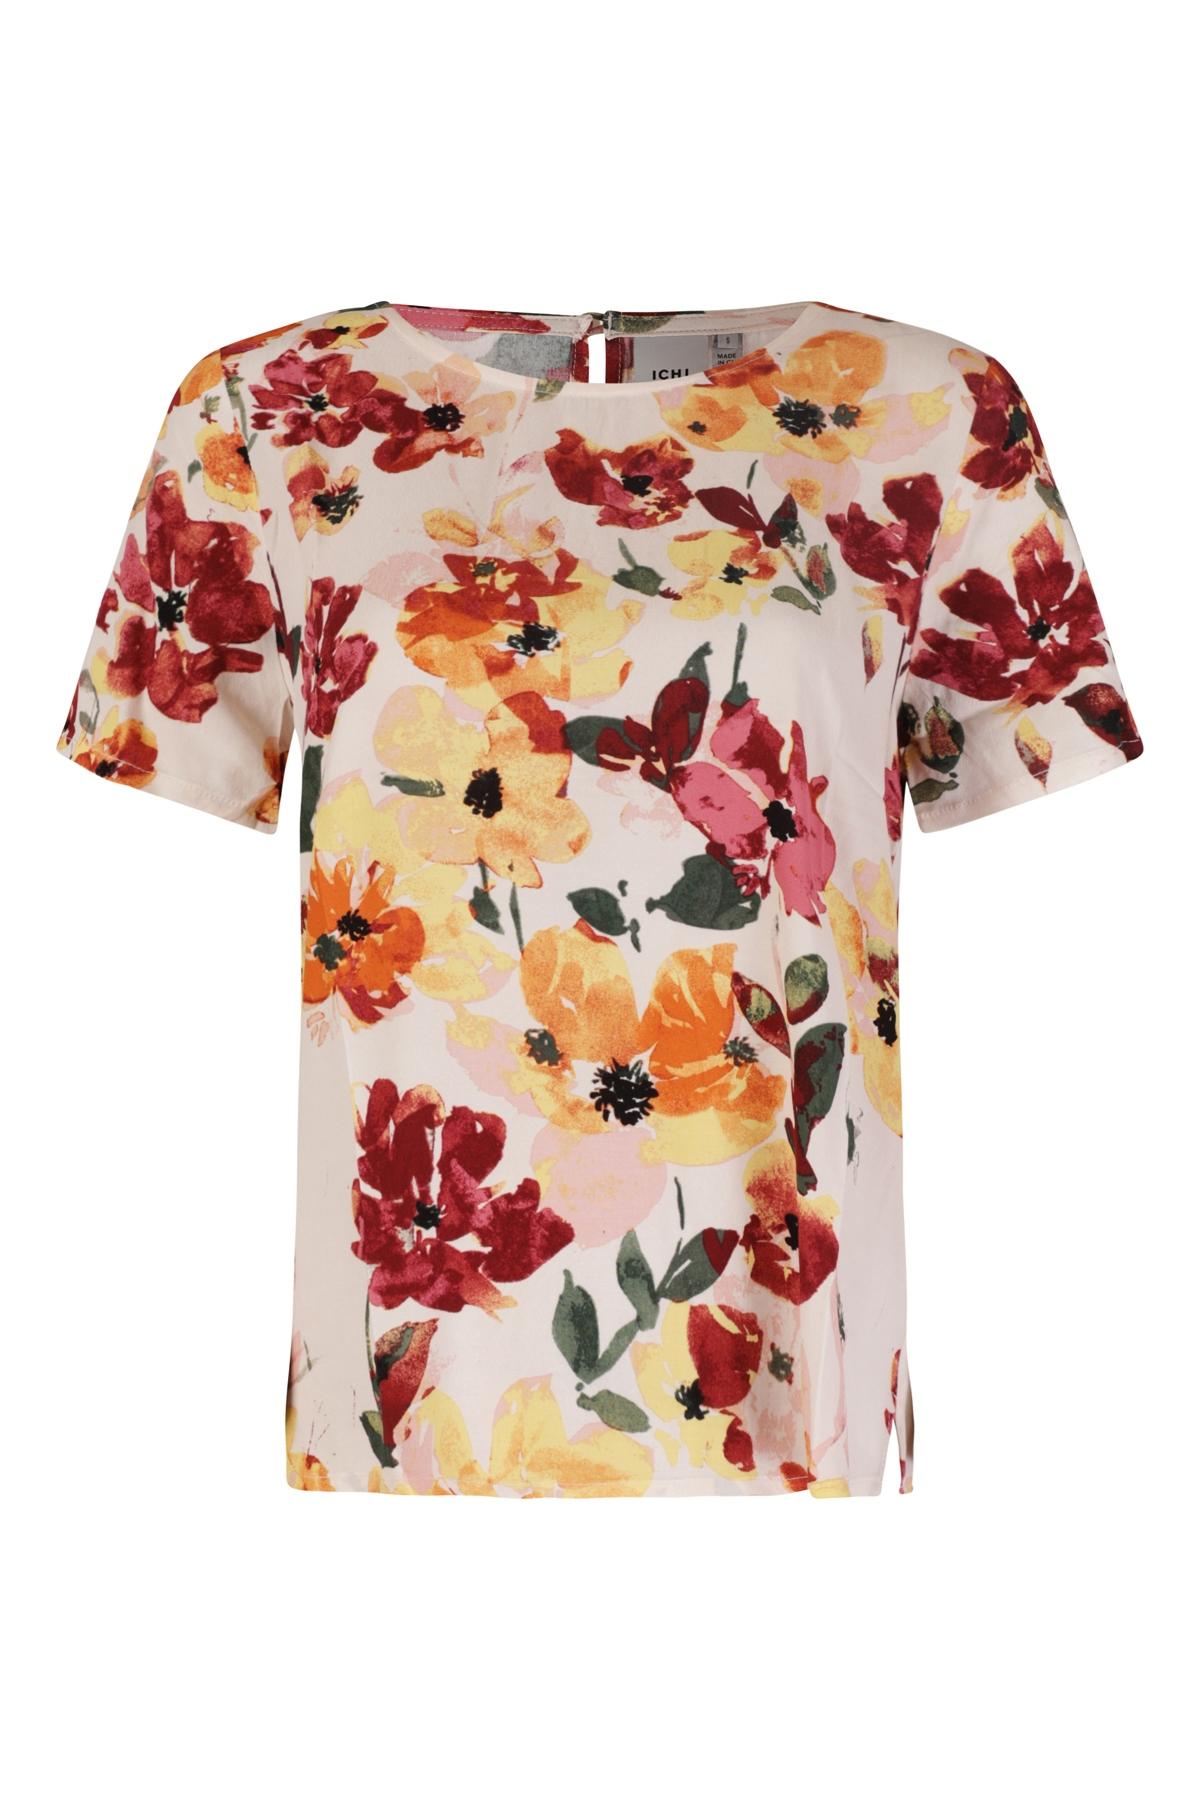 ICHI Shirt - Top Multicolor Ihbrunsa SS